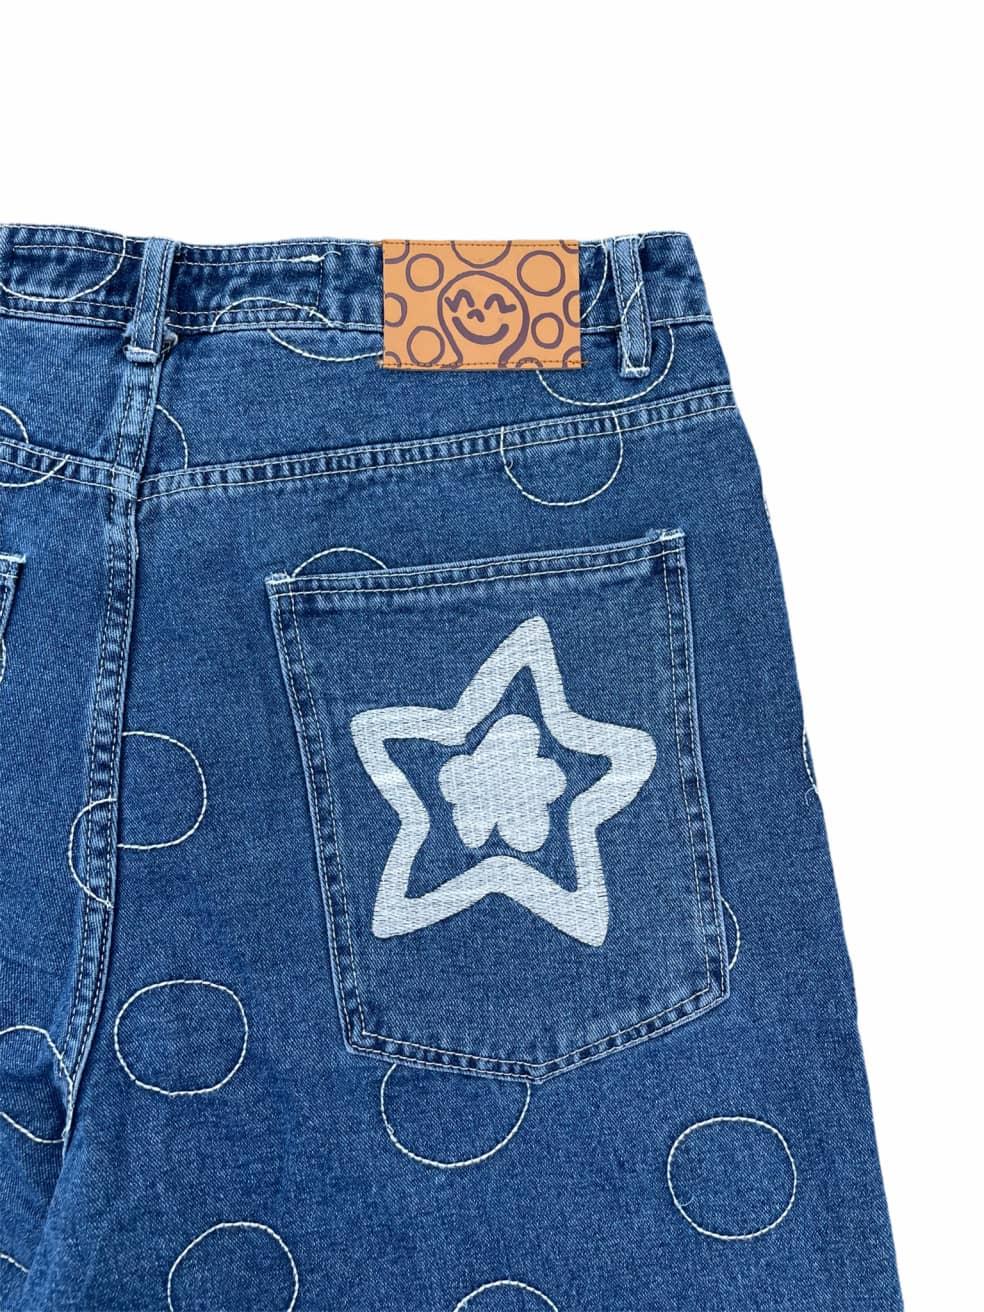 Fideicide Blue Polka Jorts   Shorts by Homies 3